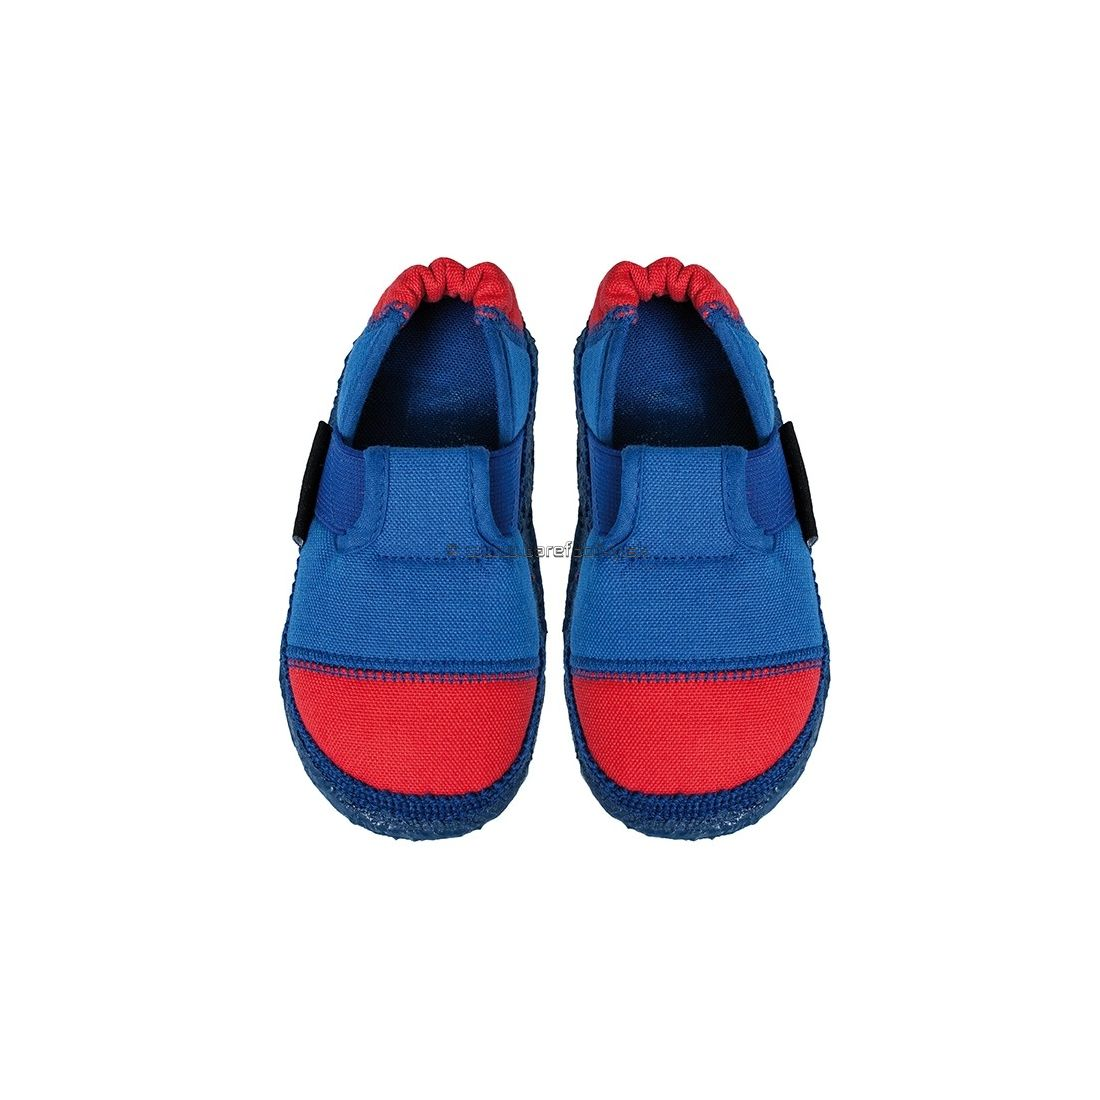 f3f3bd943 Barefootky - Nanga - Nanga - Klette papučky modré